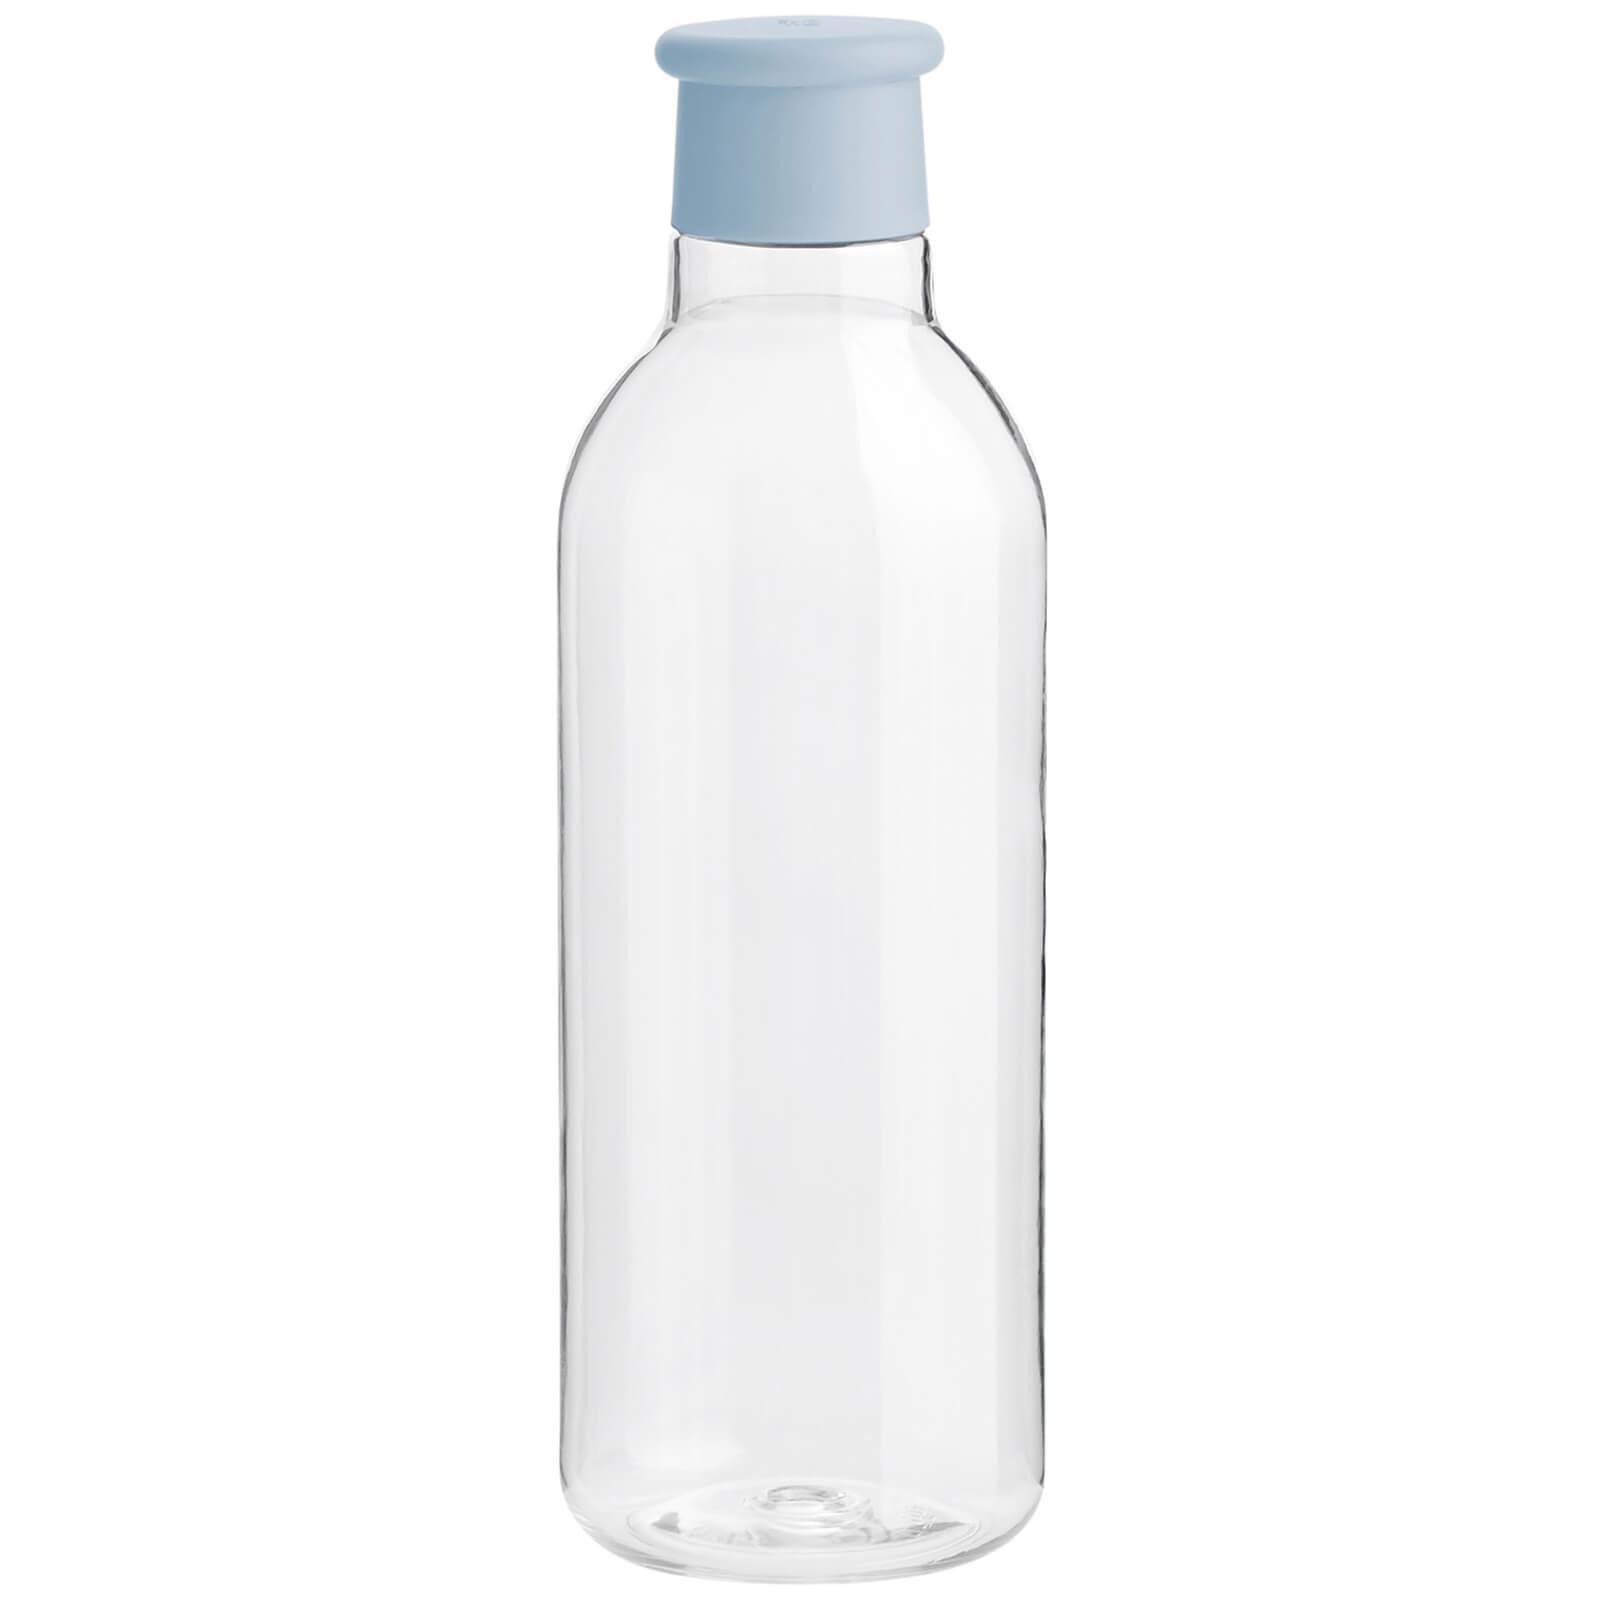 RIG-TIG Drink-It Water Bottle 0.75l - Light Blue